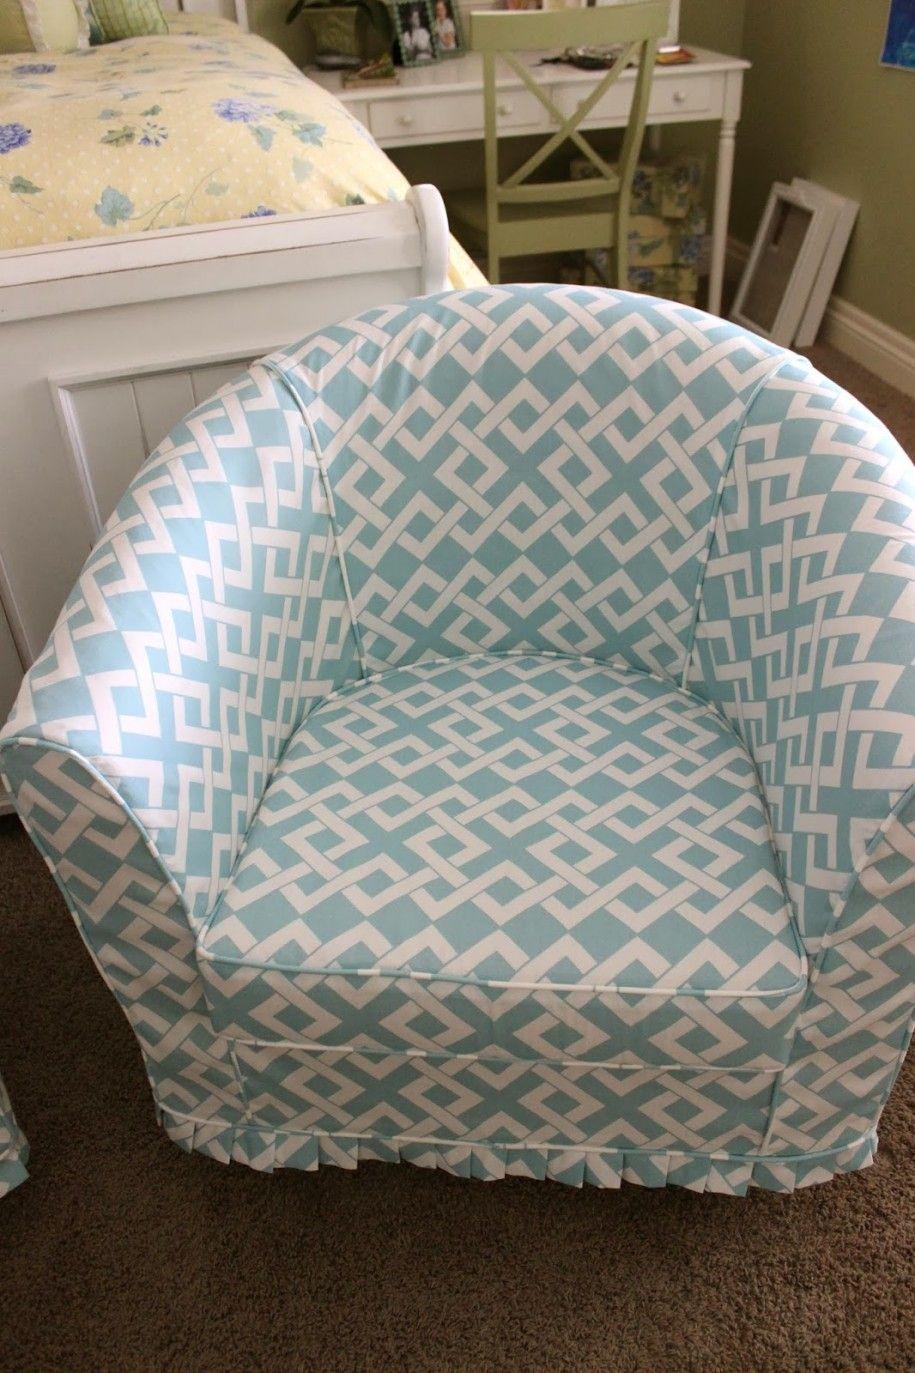 Barrel Chair Slipcovers Ideas Best Chair Slipcovers